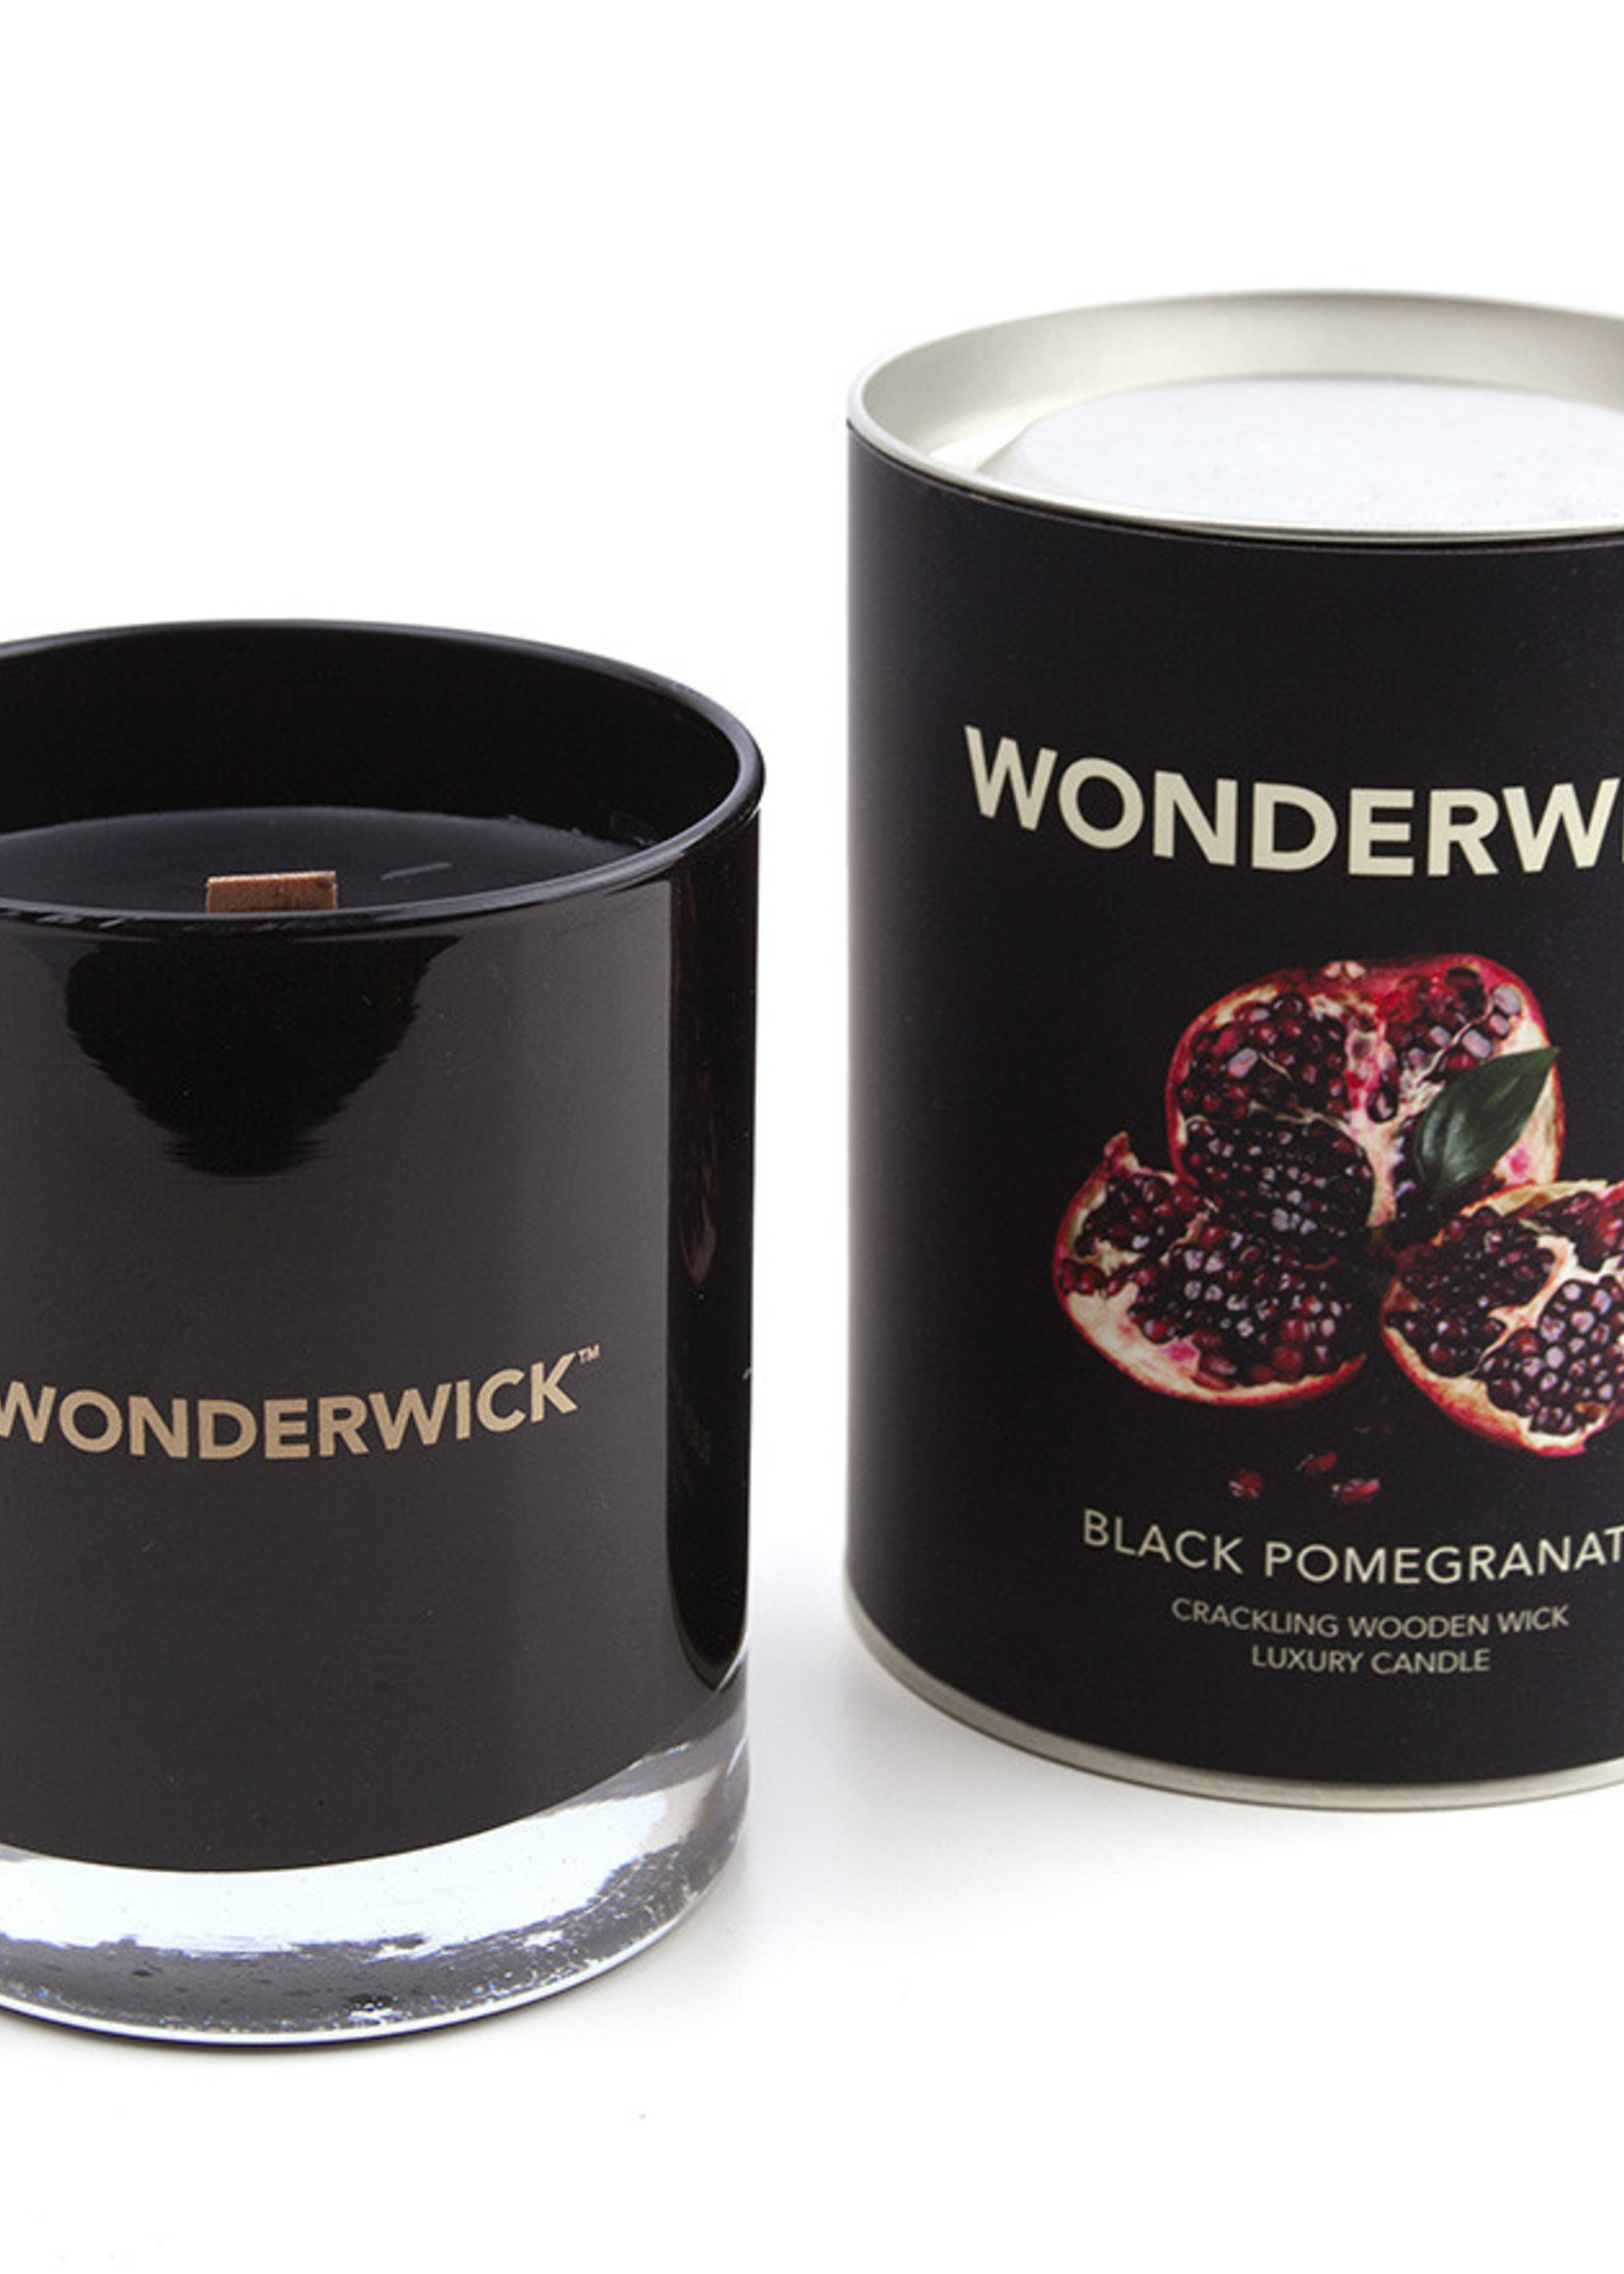 Black Pomegranate noir